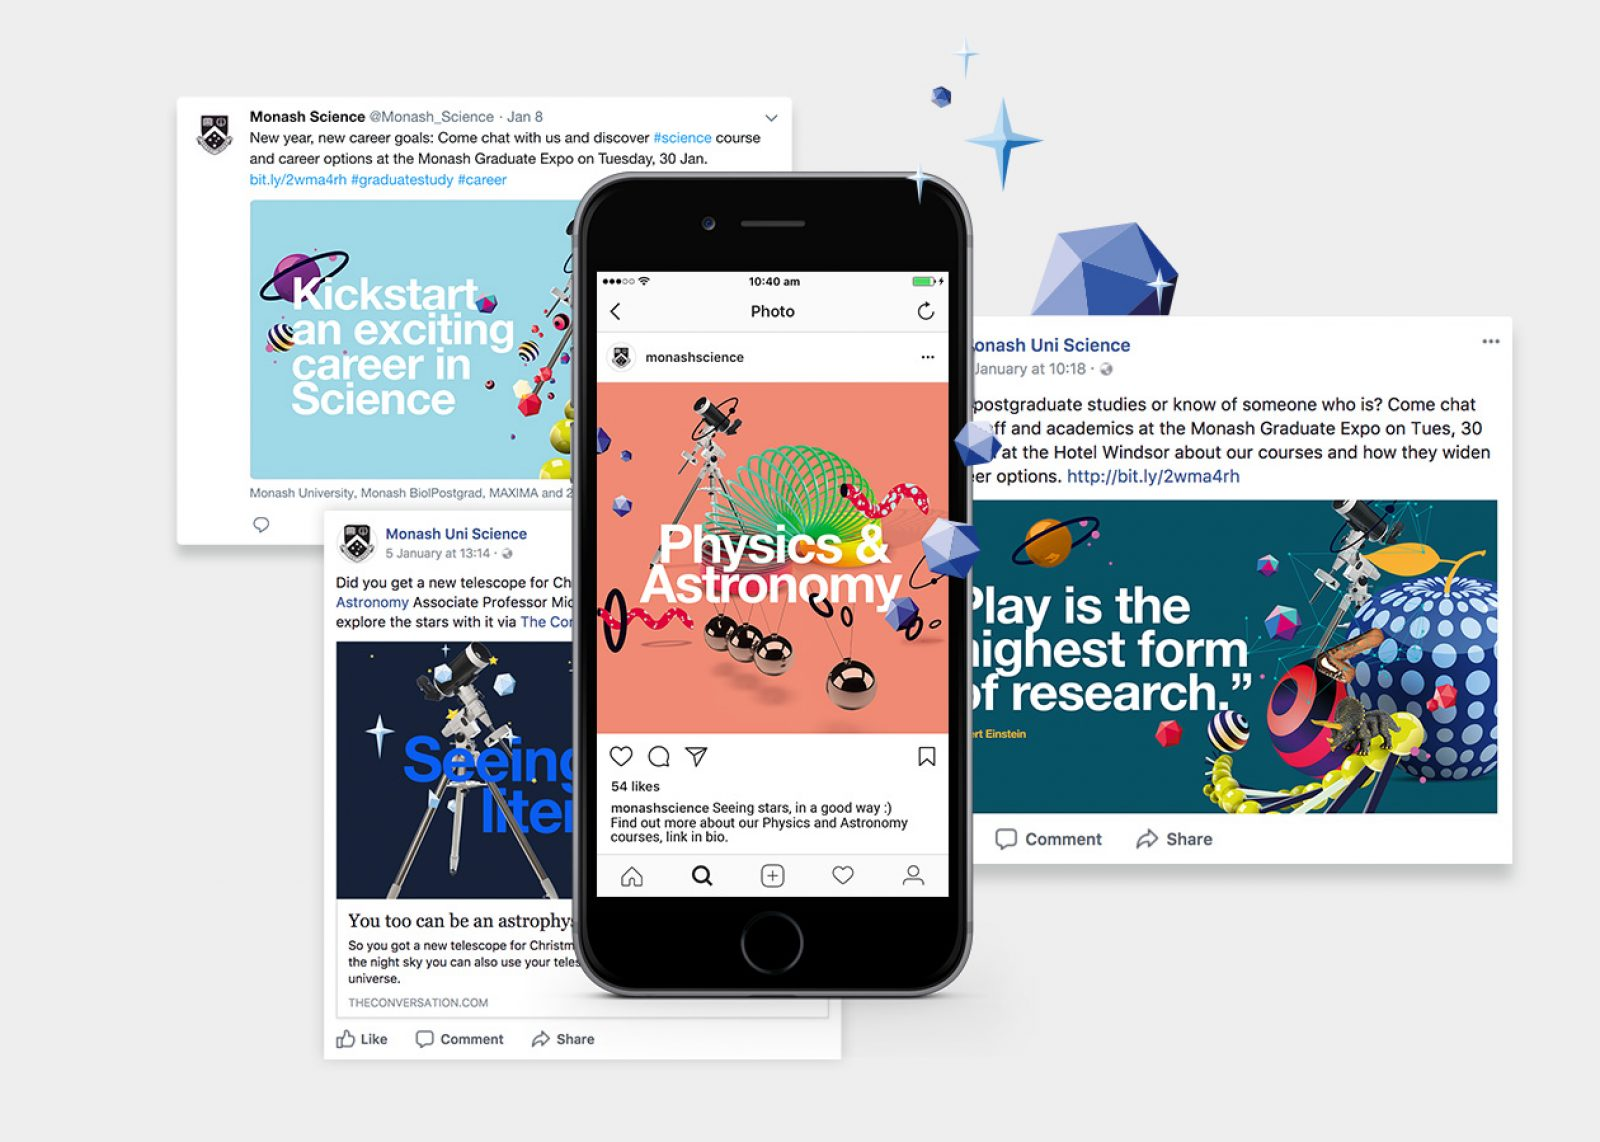 Monash Science Careers Guide - social media marketing assets